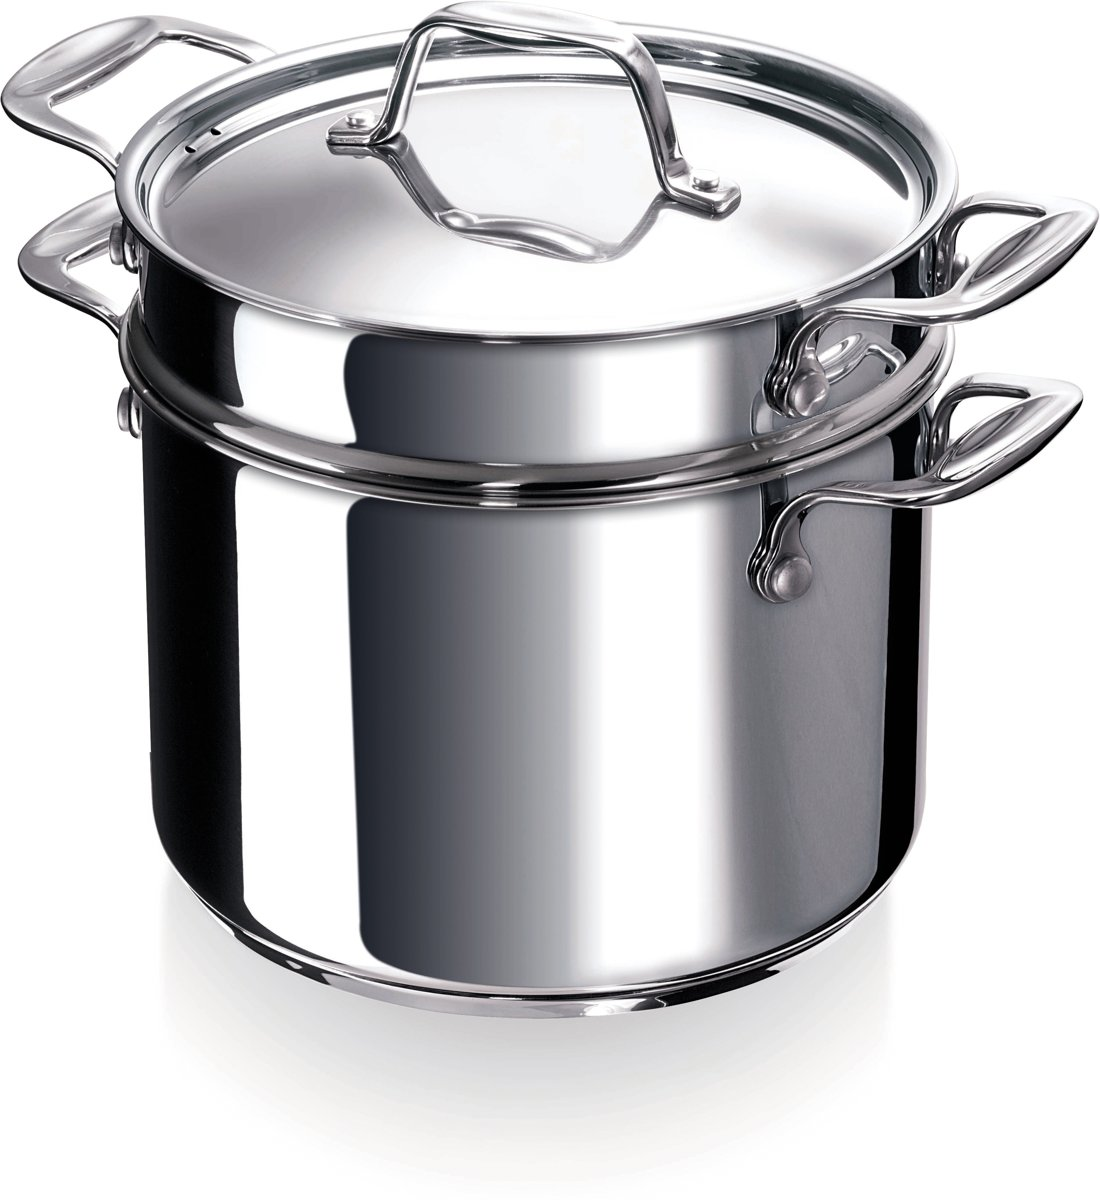 BEKA Chef Pastakookpan - Ø 20 cm - 4.4 Liter